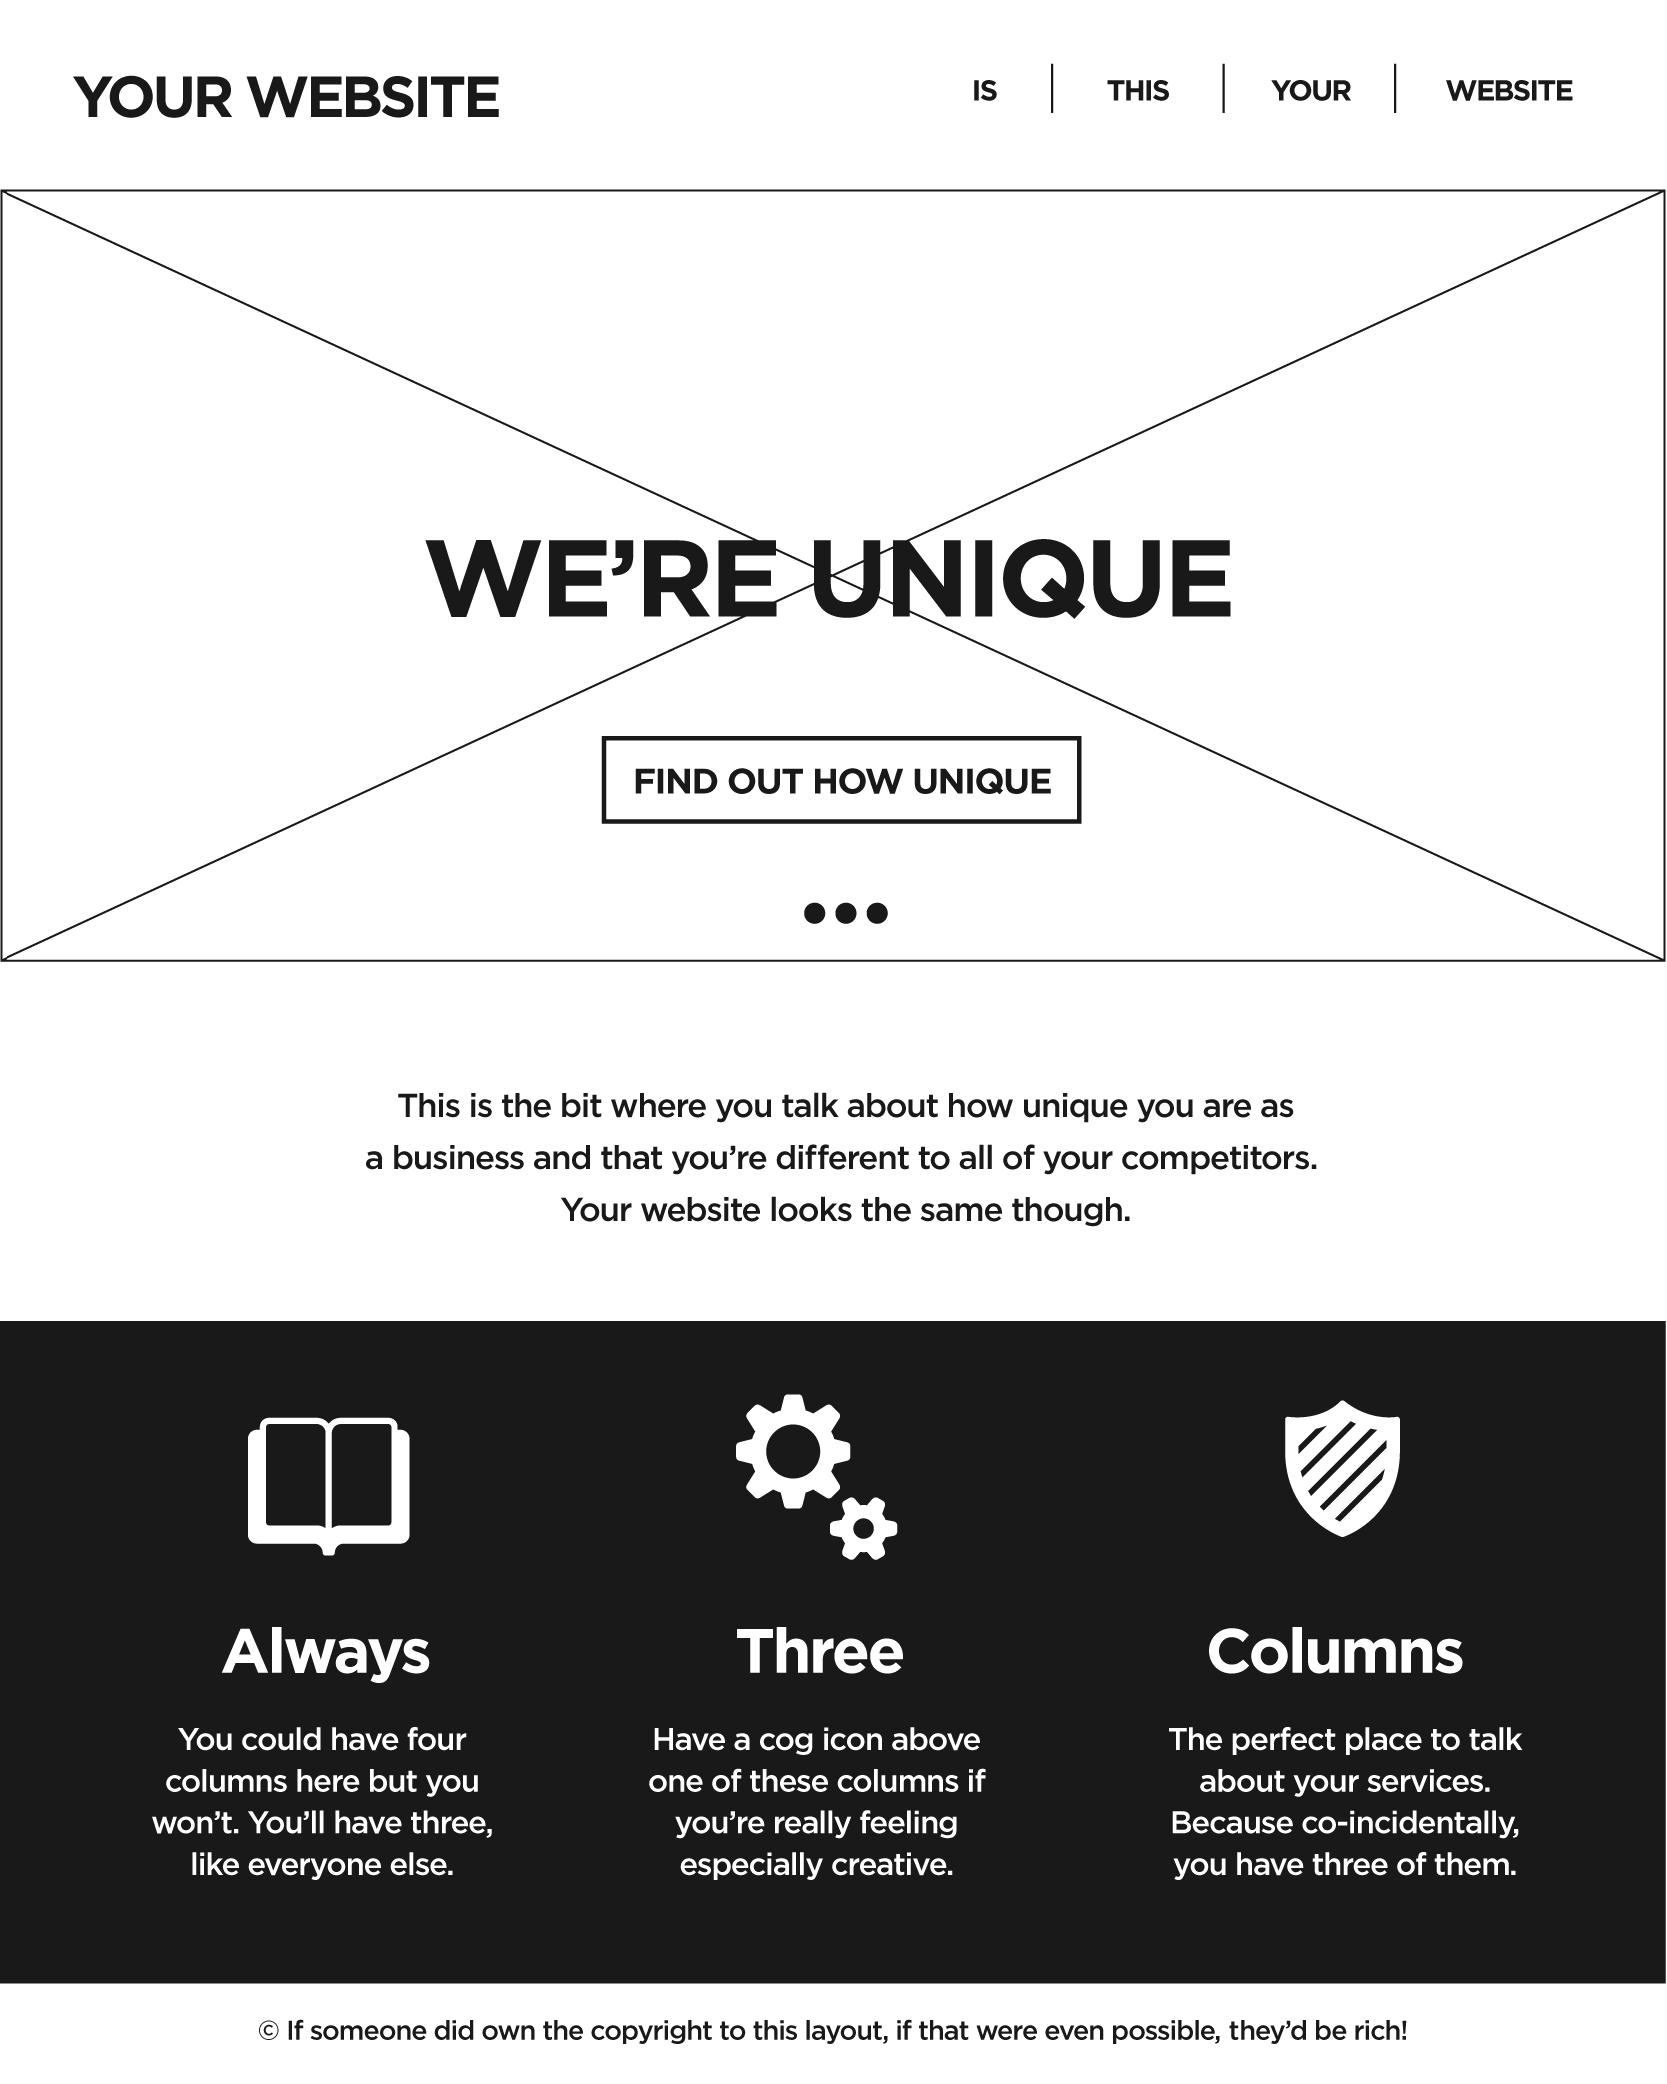 your website template via Dave Ellis